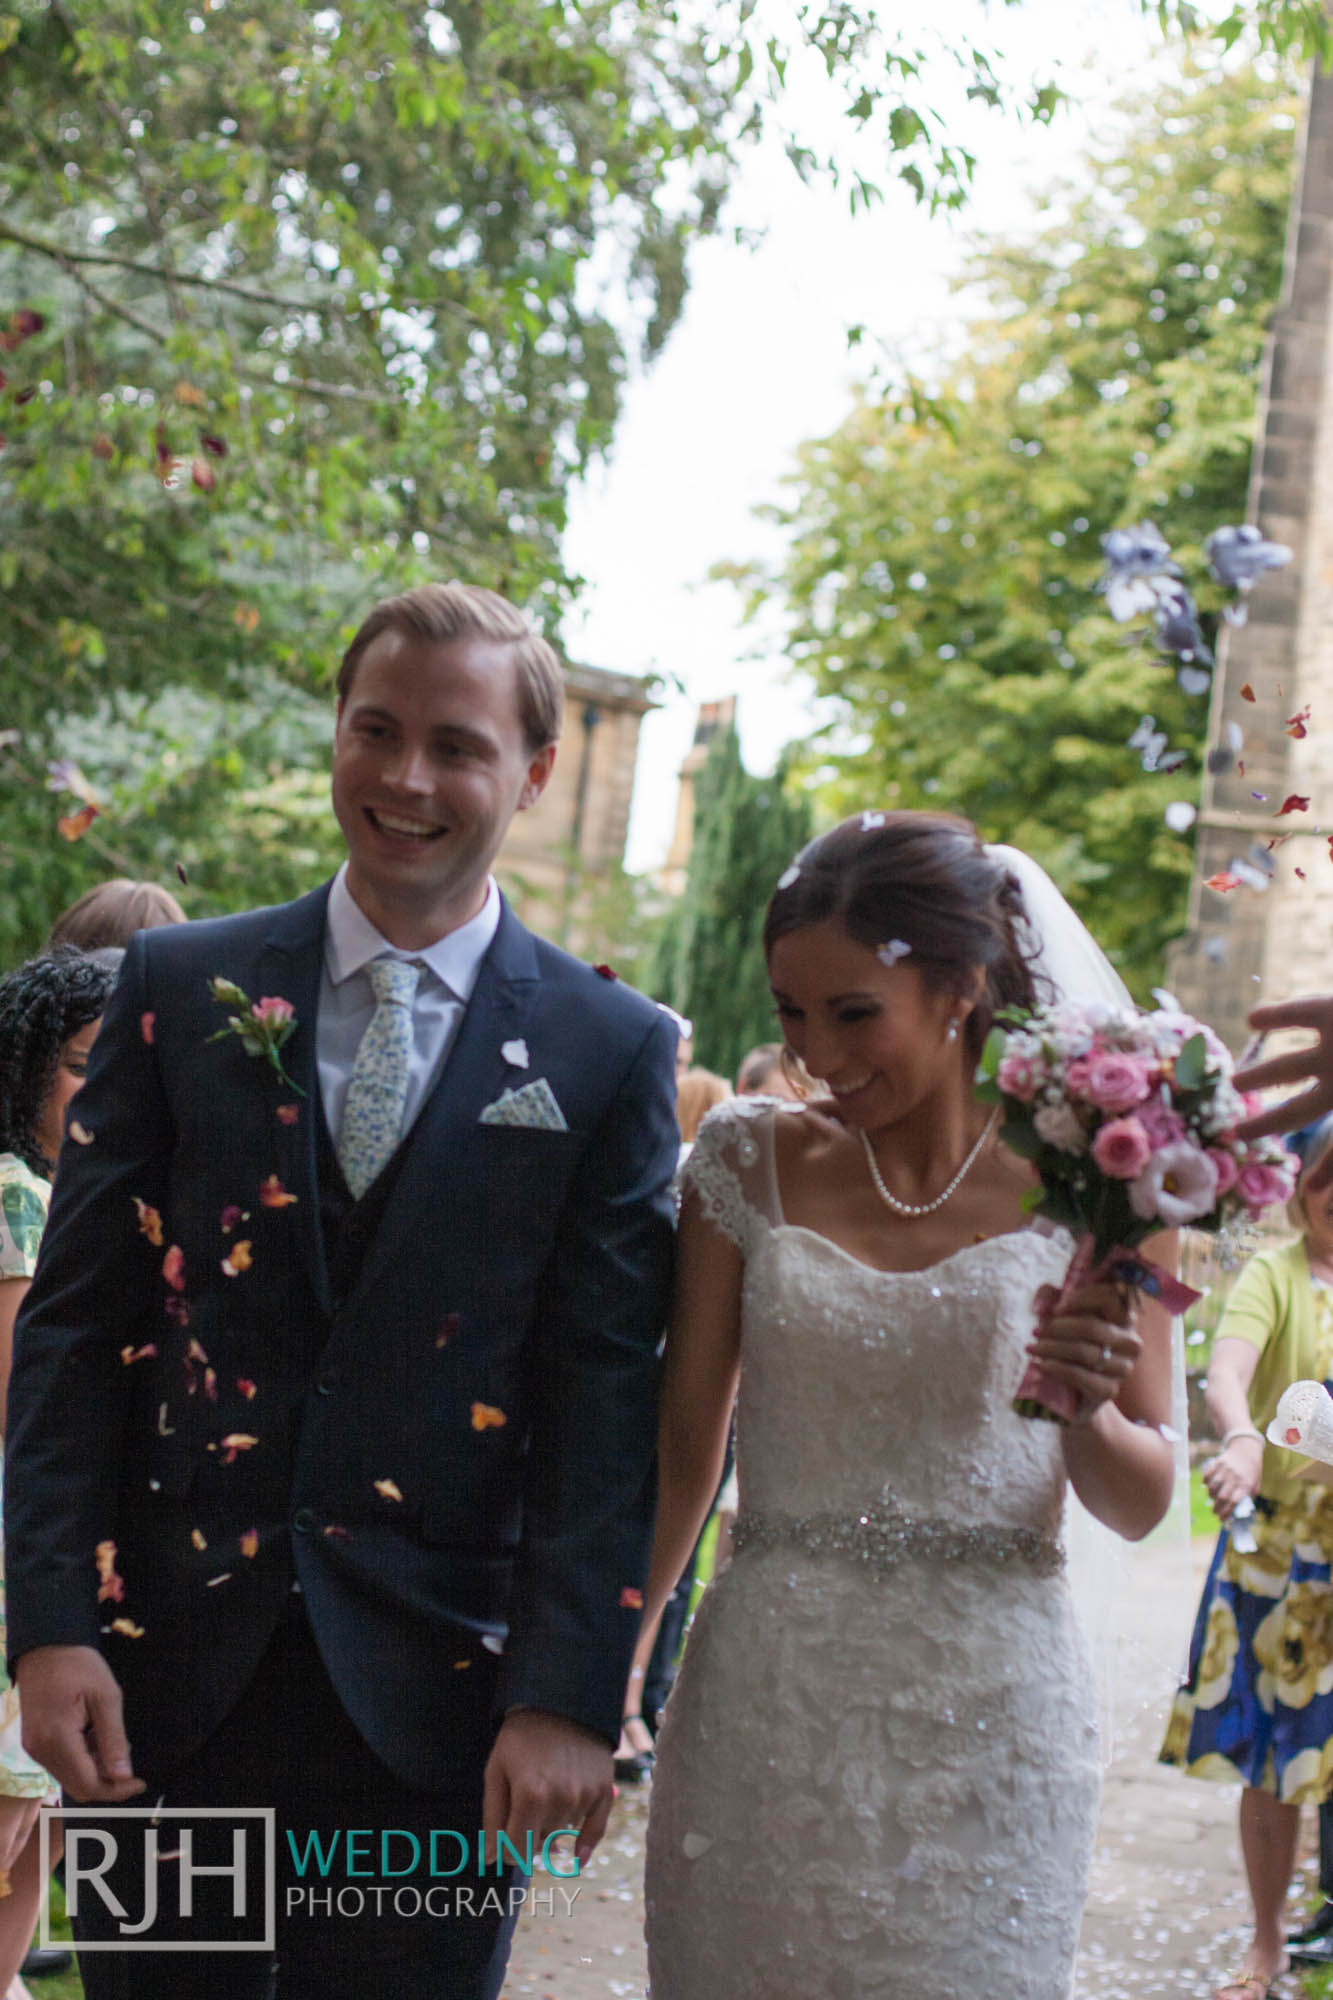 RJH Wedding Photography_Tankersley Manor Wedding_28.jpg